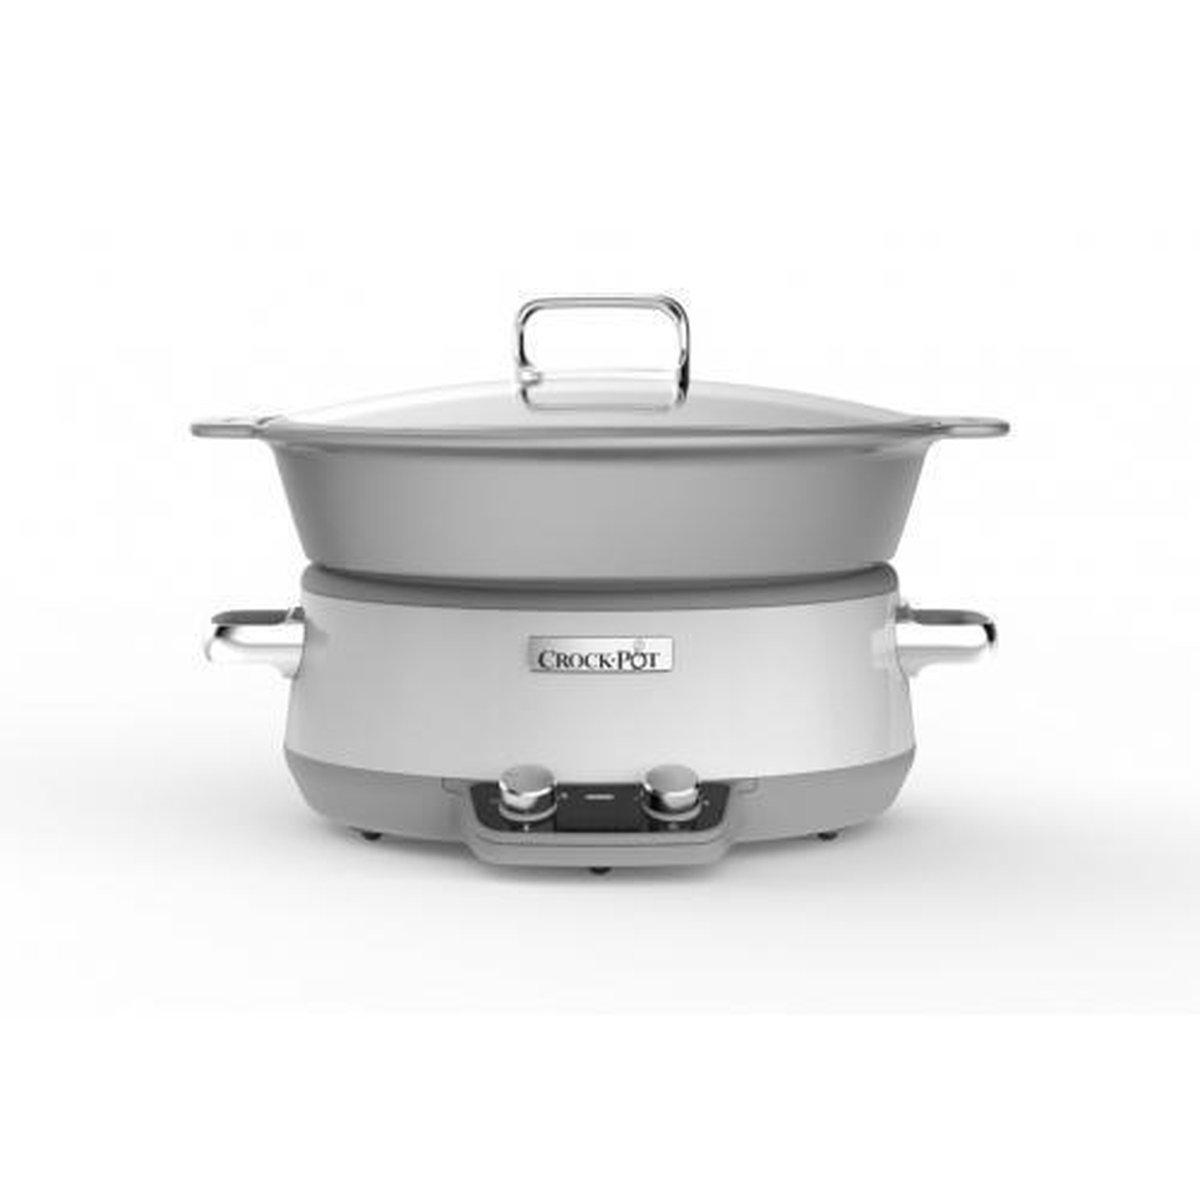 Crock Pot CR027X - Slowcooker